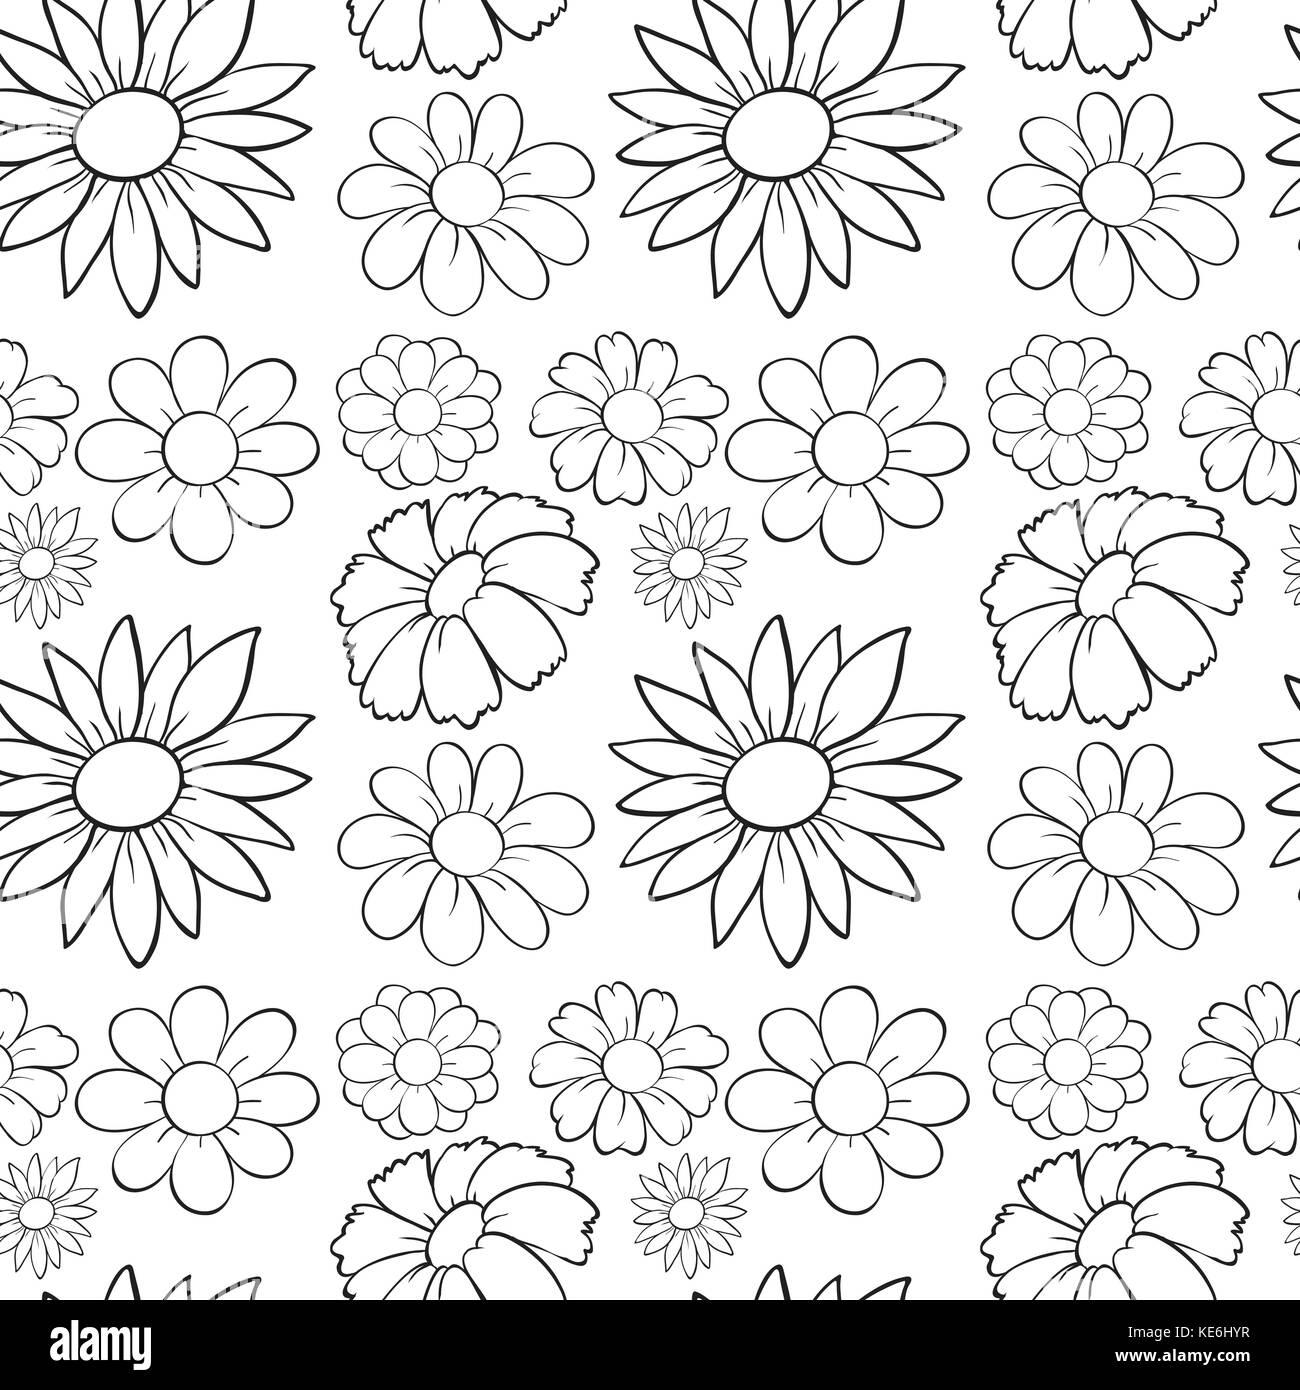 Seamless flowers in draft illustration - Stock Vector